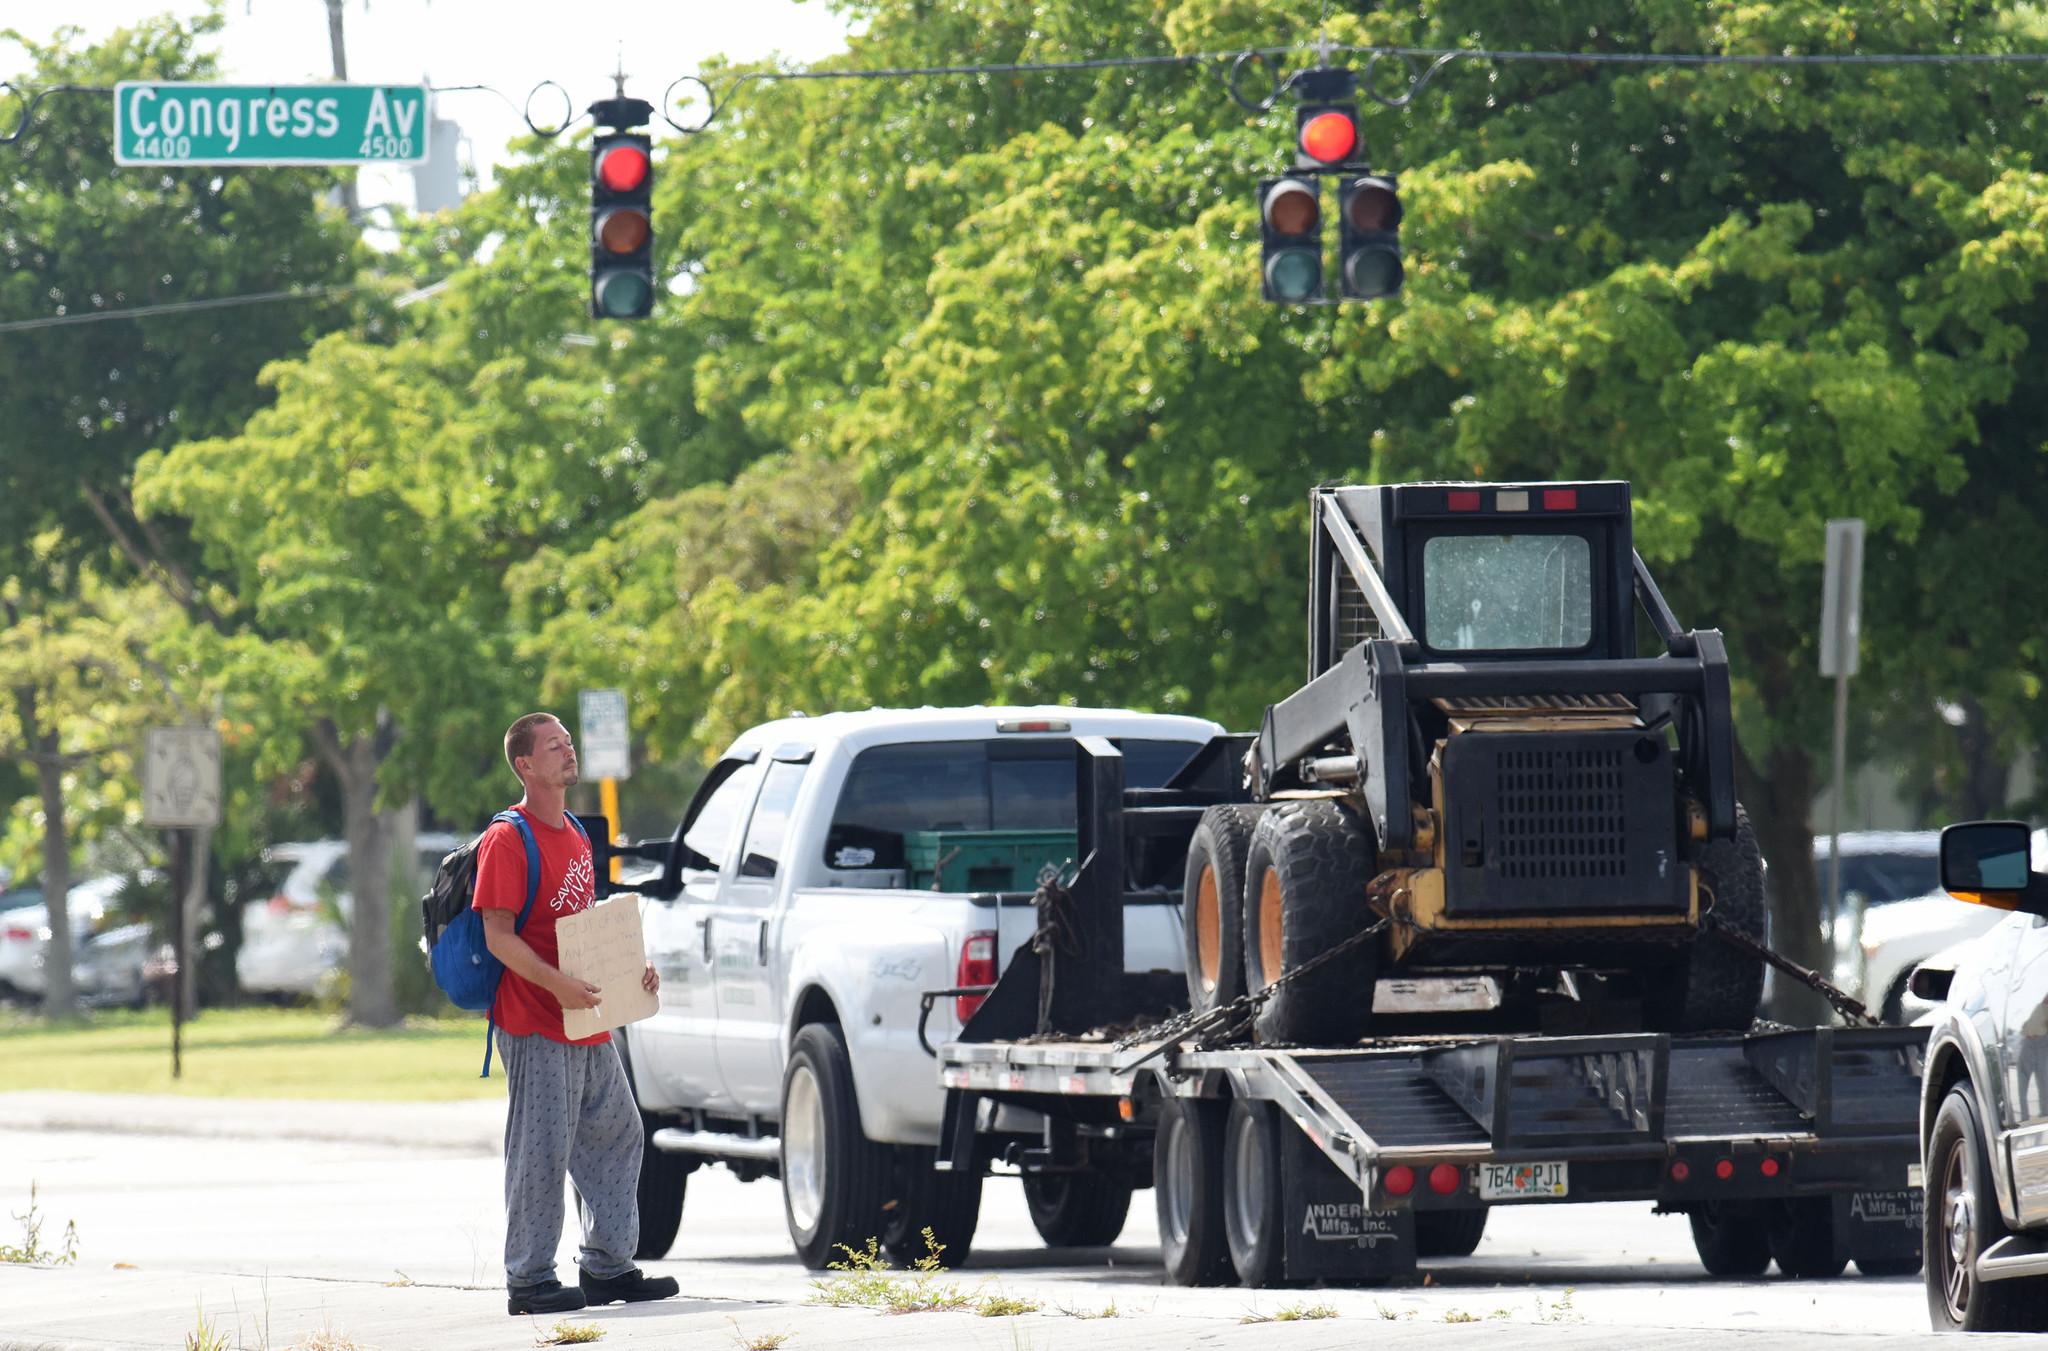 Palm Beach County bans panhandling, fundraising on roads - Sun Sentinel